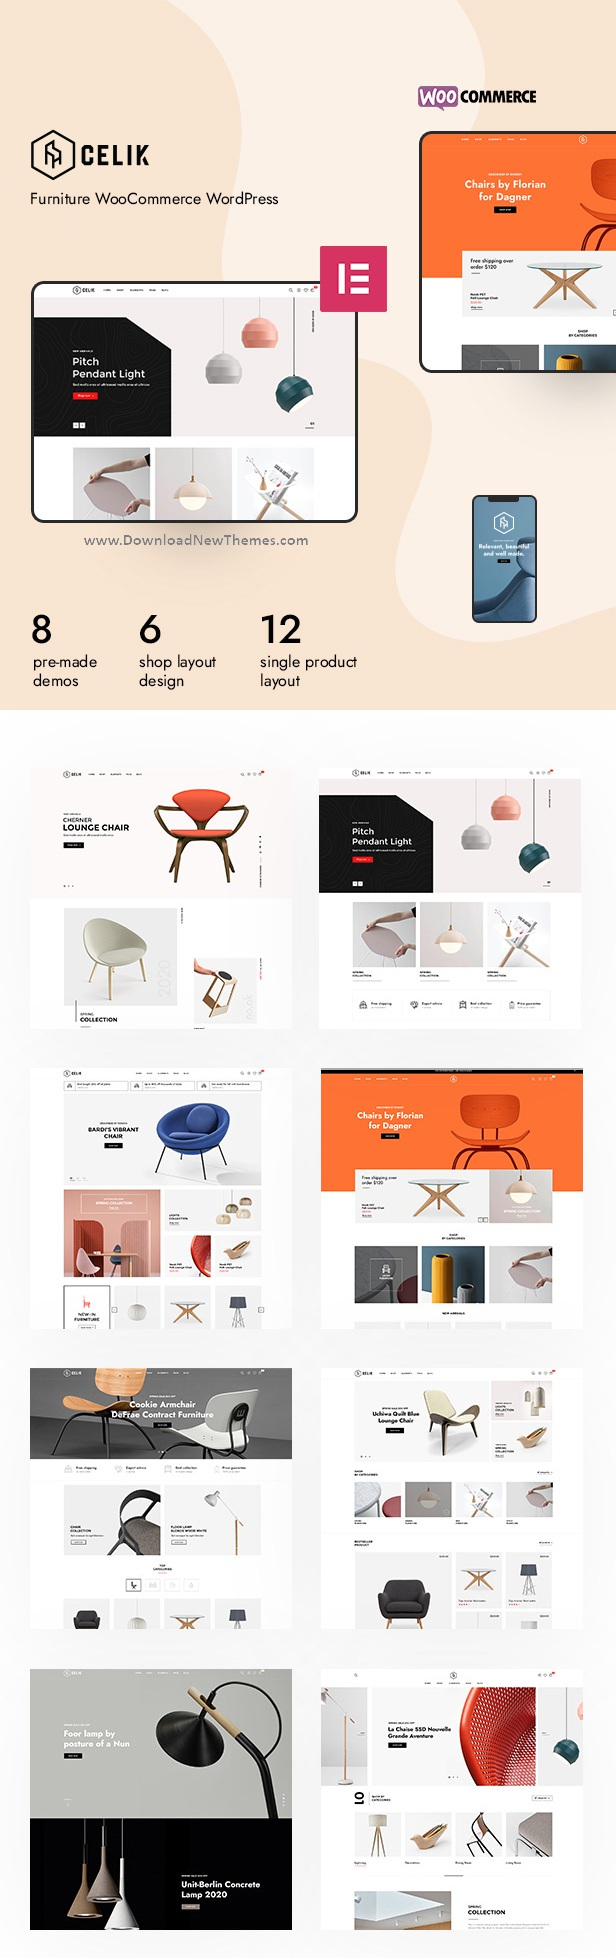 Celik - Furniture WooCommerce Theme